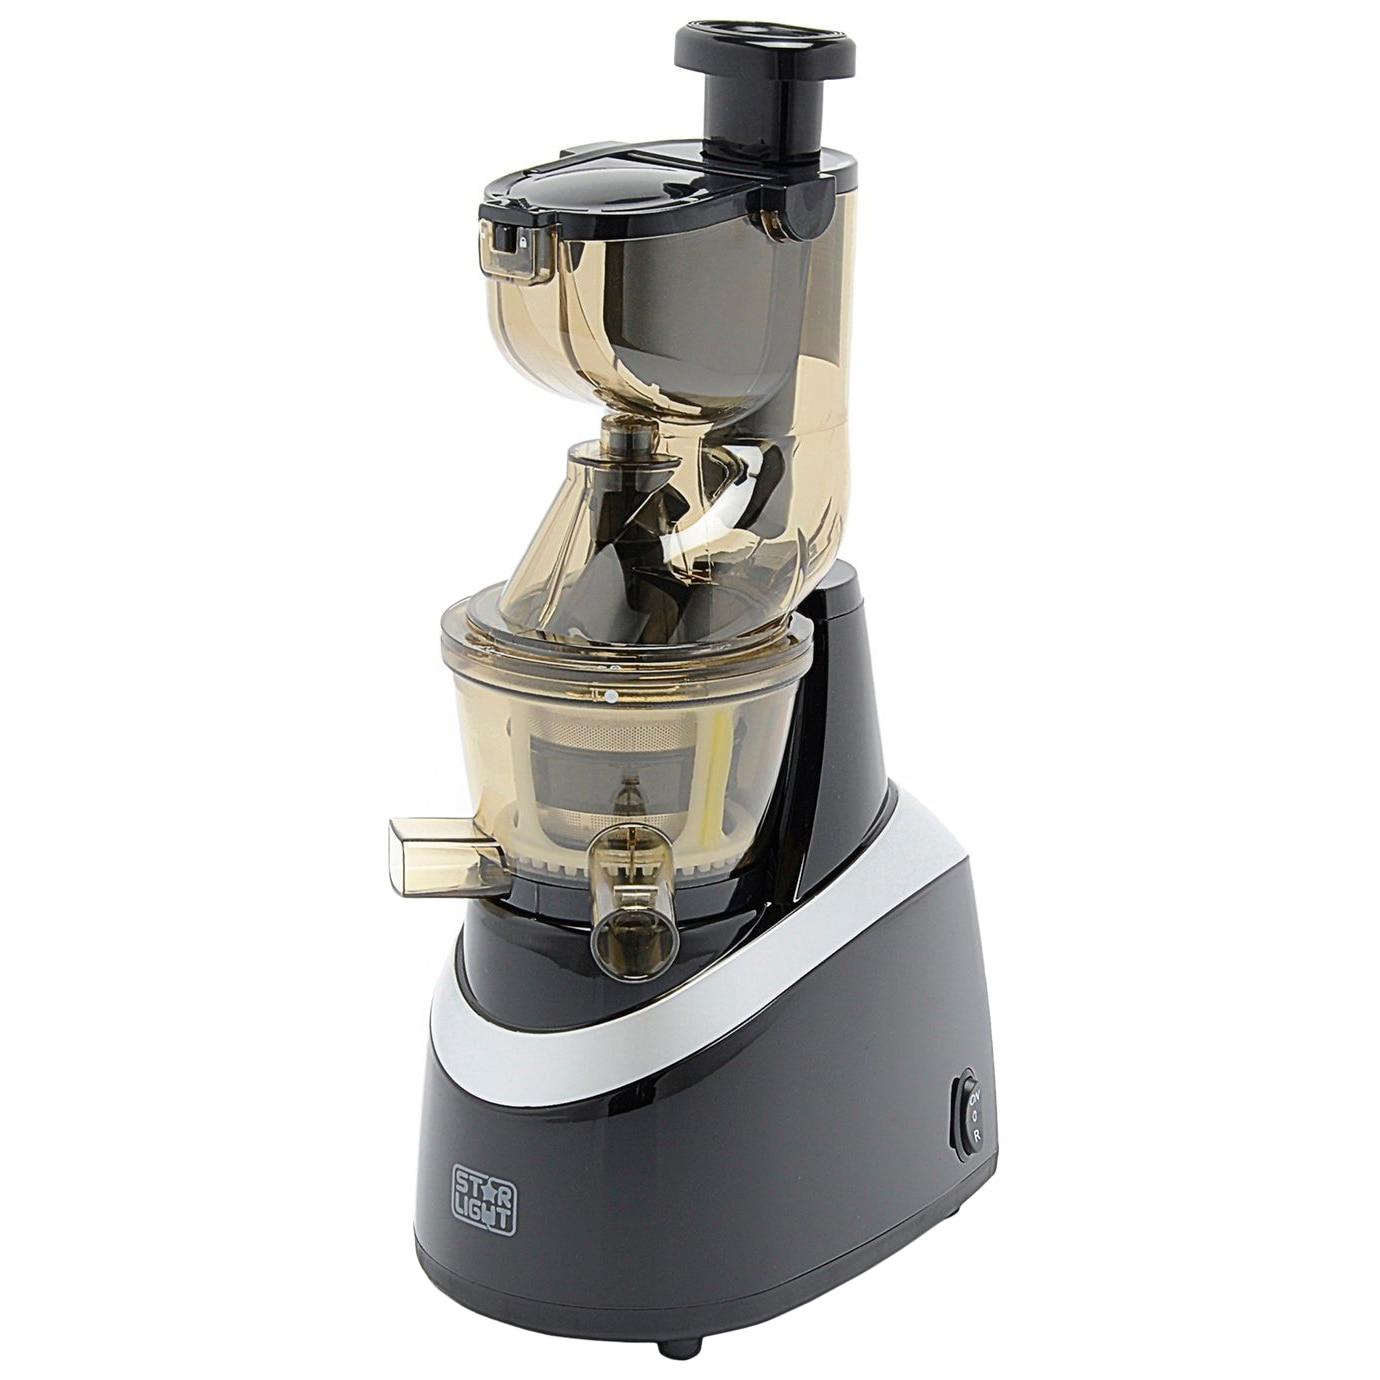 Fotografie Storcator de fructe si legume cu melc Star-Light SJB-240B, 240 W, 80 RPM, Recipient suc 1.0 l, Recipient pulpa 0.8 l, Functie Reverse, Tub alimentare 80 mm, Negru/Argintiu